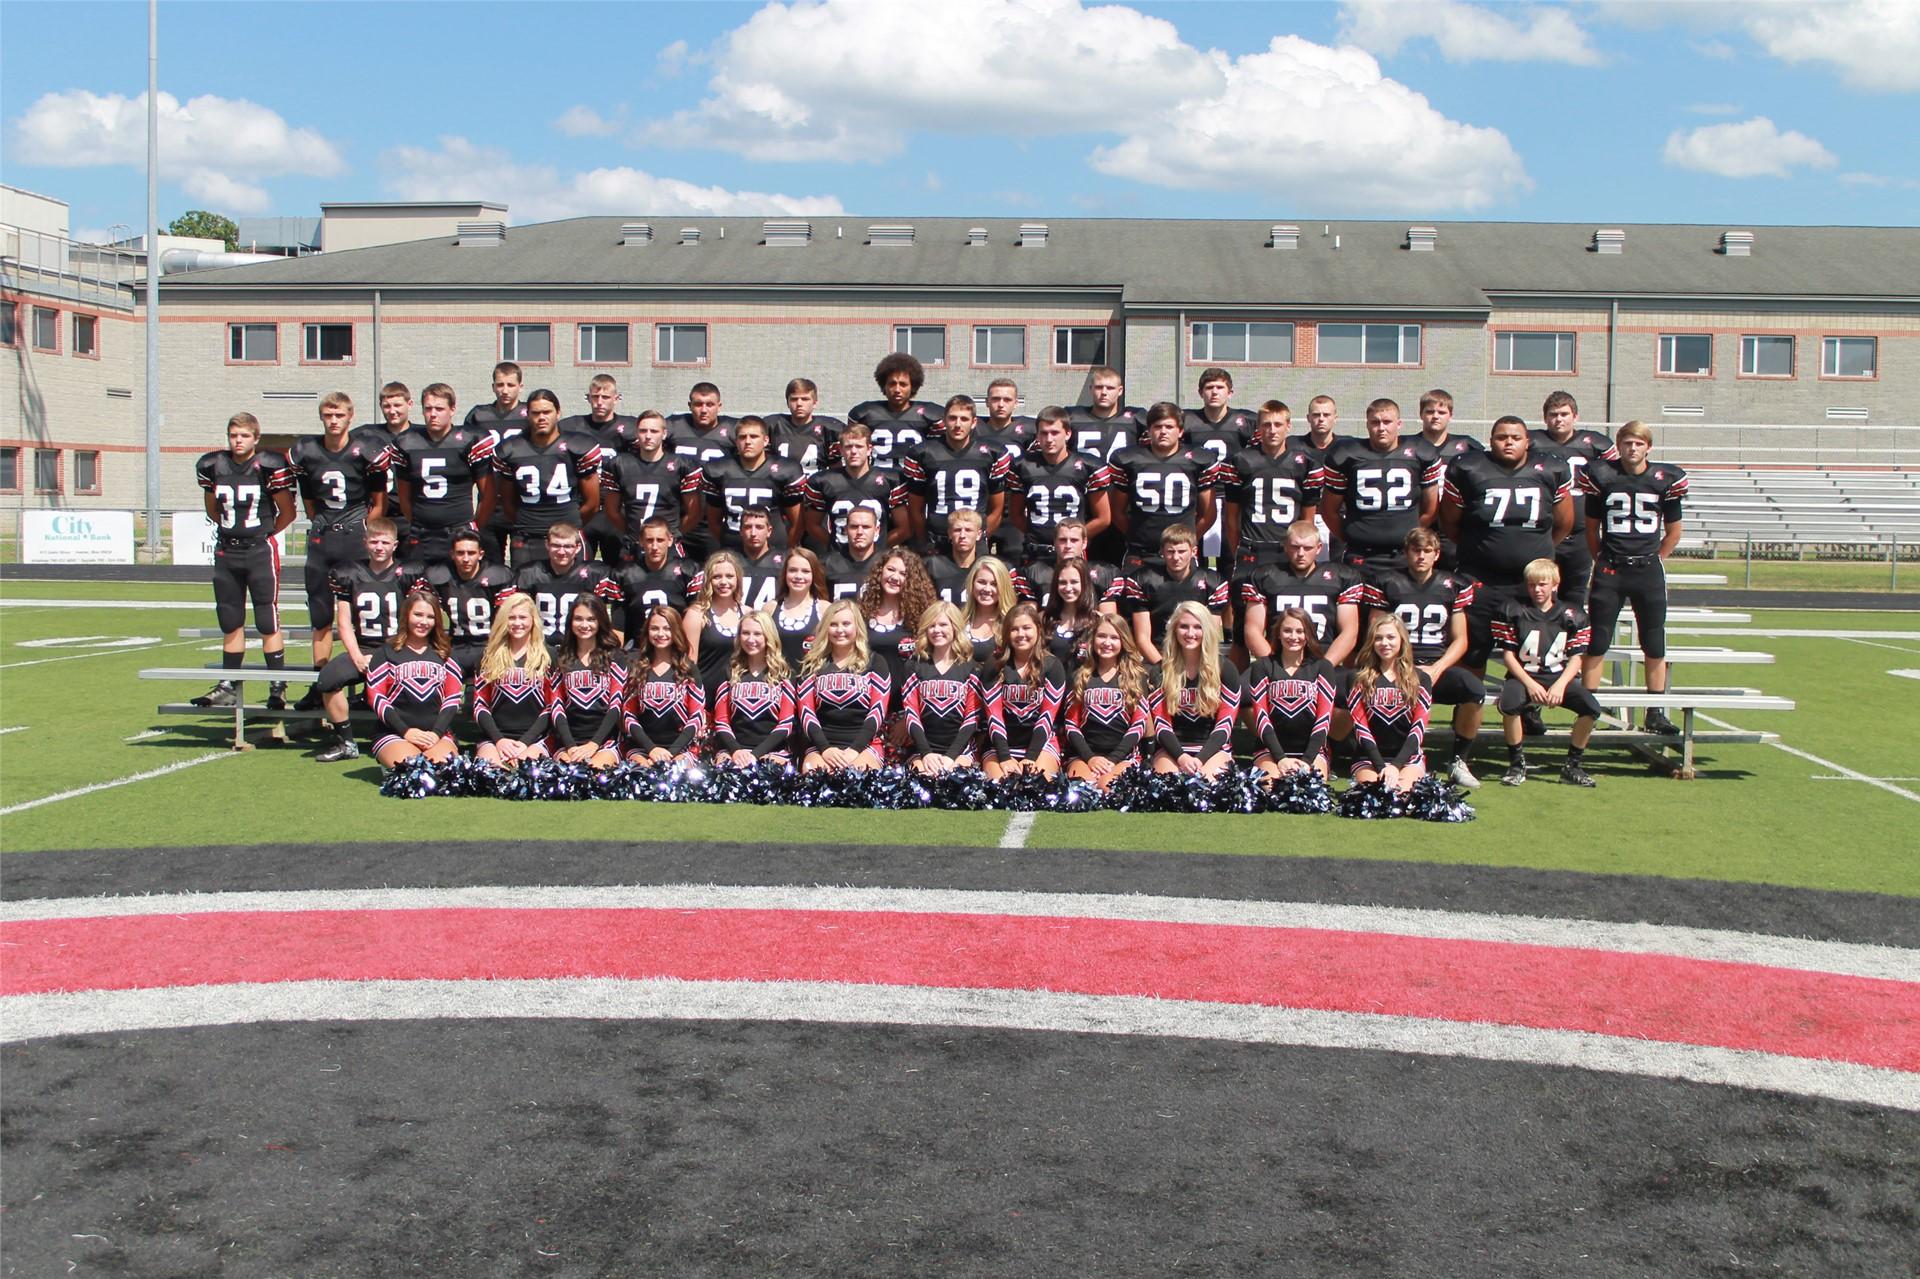 2016-2017 High School Football Team